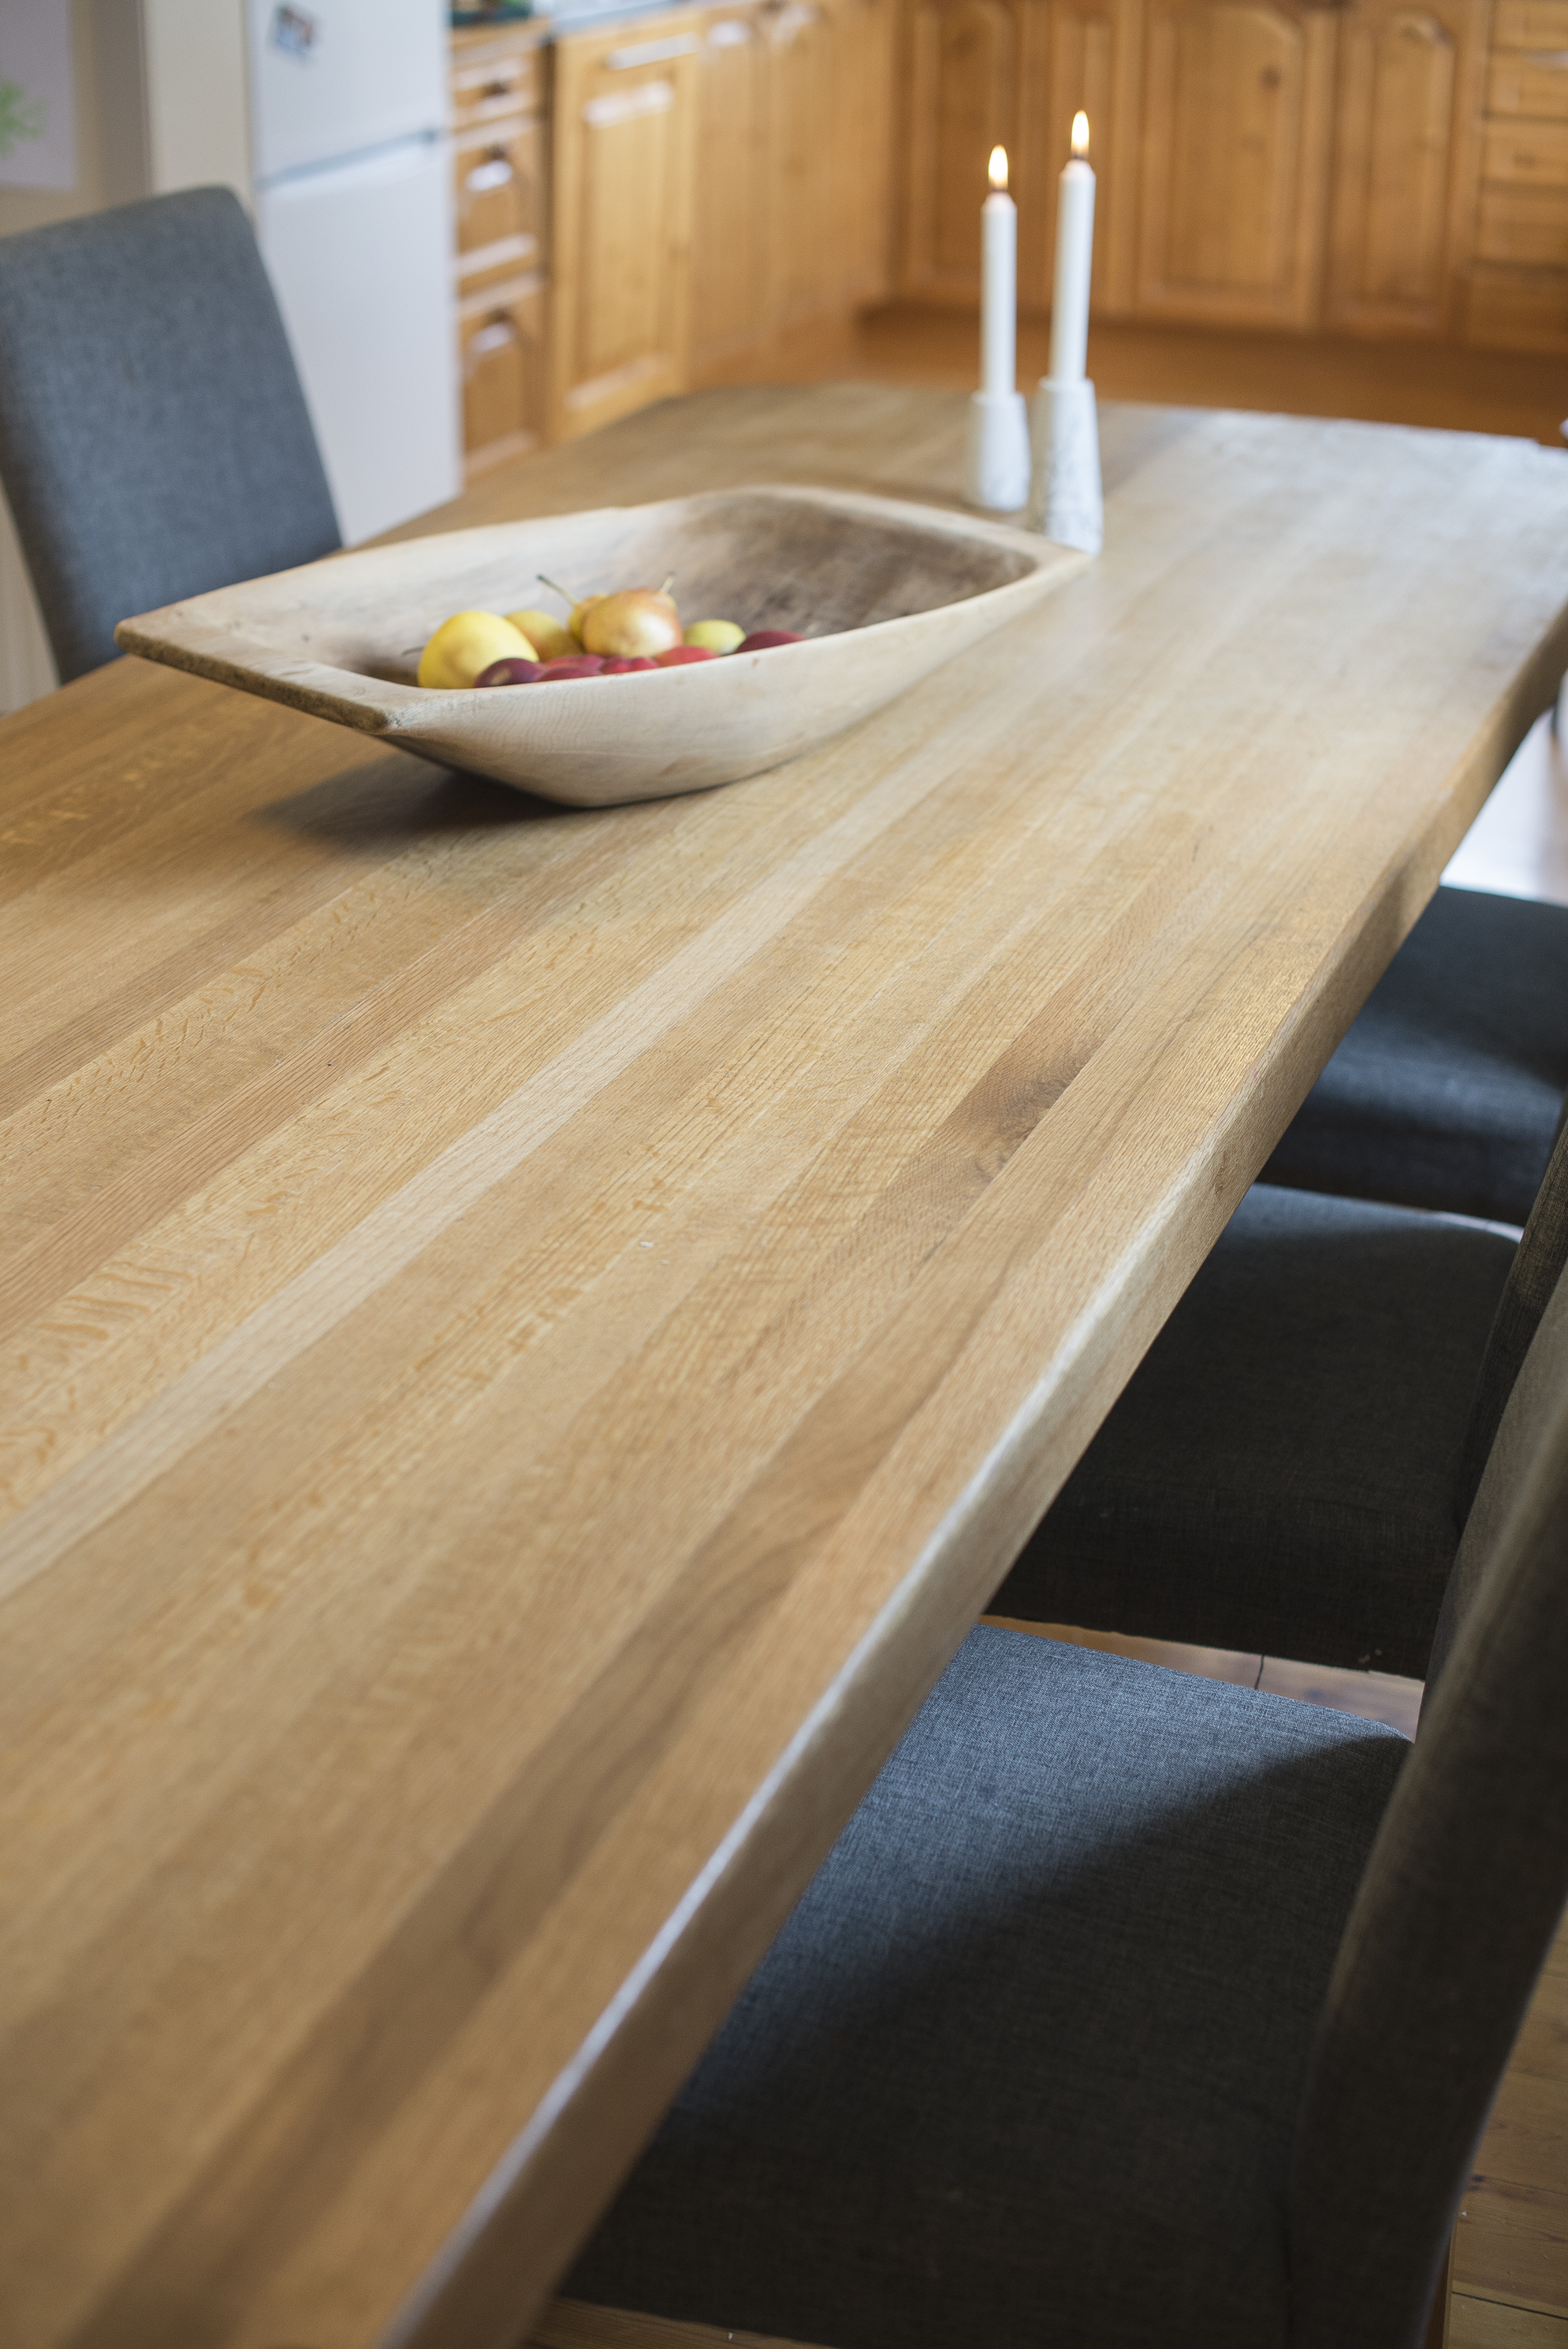 Et realt langbord med en solid bordplate.